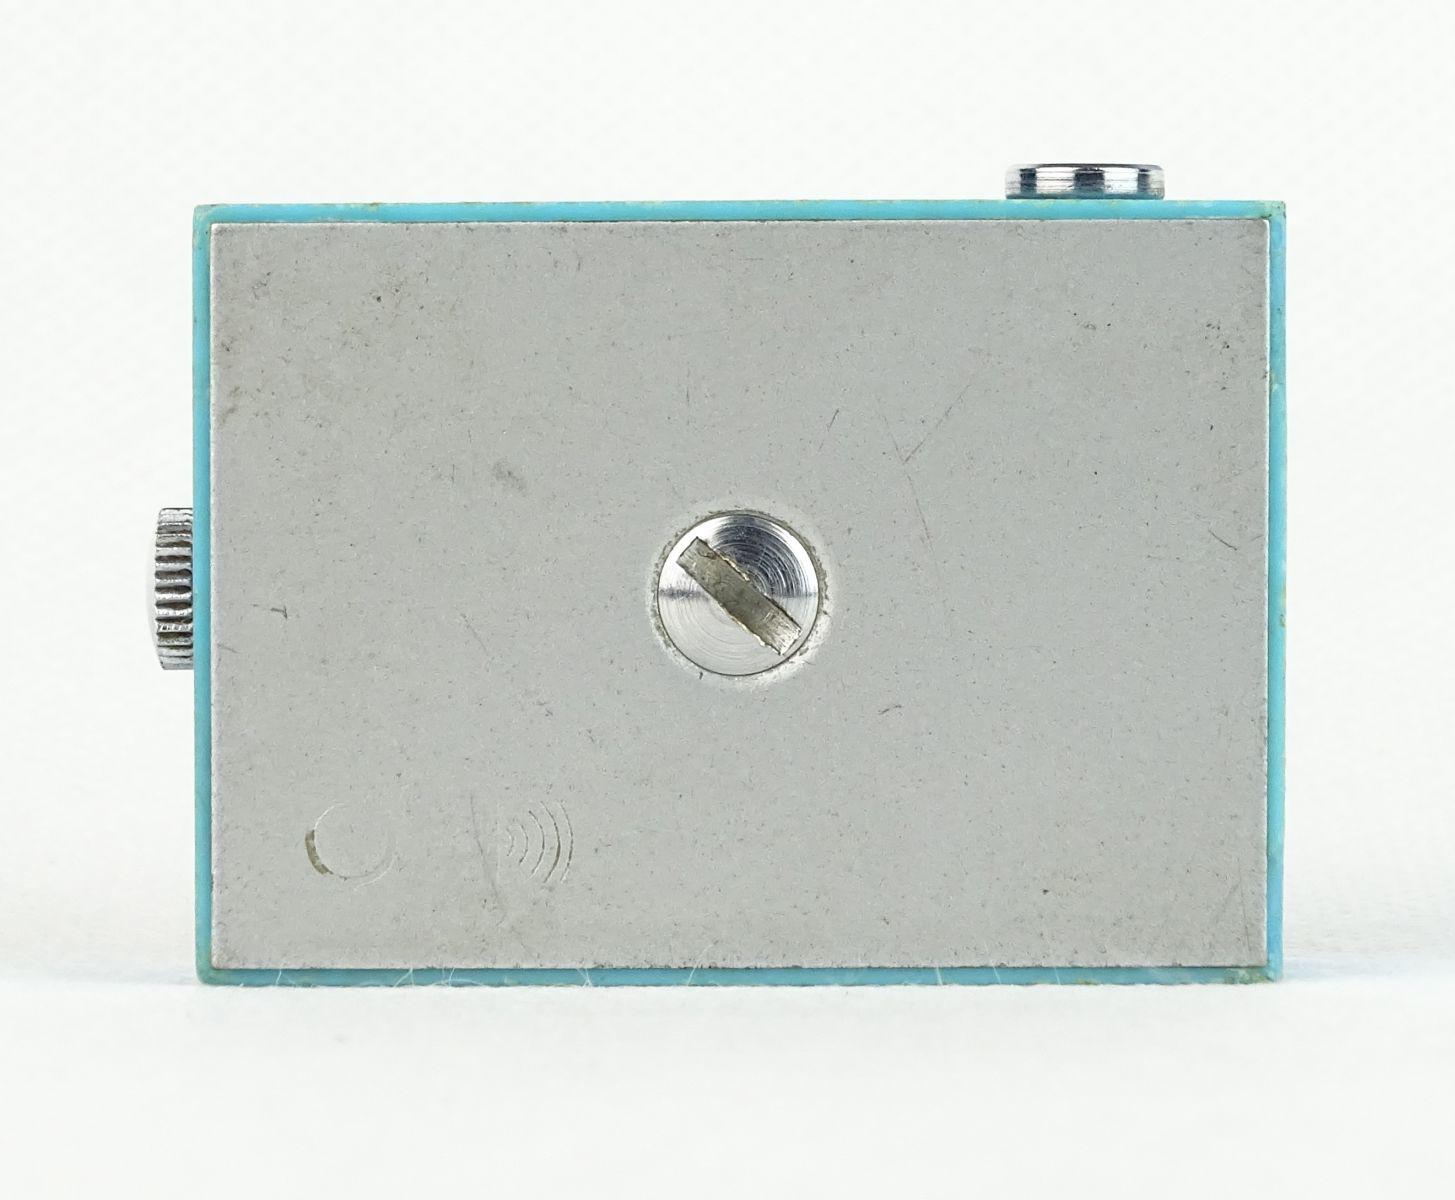 DSC03292.JPG (1455×1200)